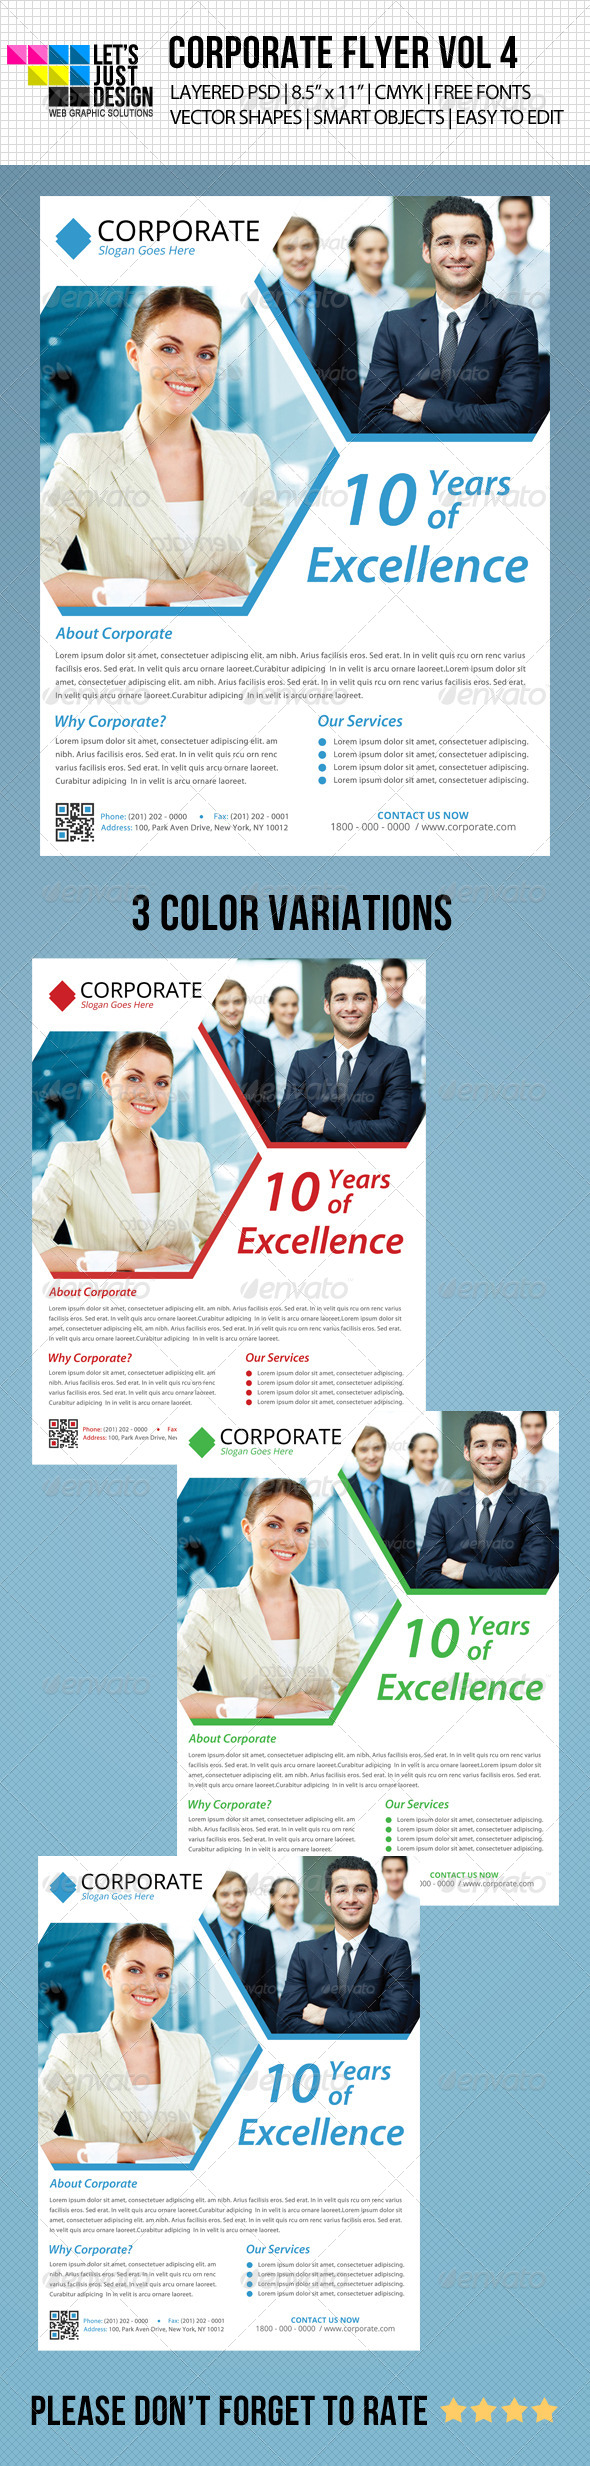 GraphicRiver Minimal Corporate Flyer Vol 4 4821890